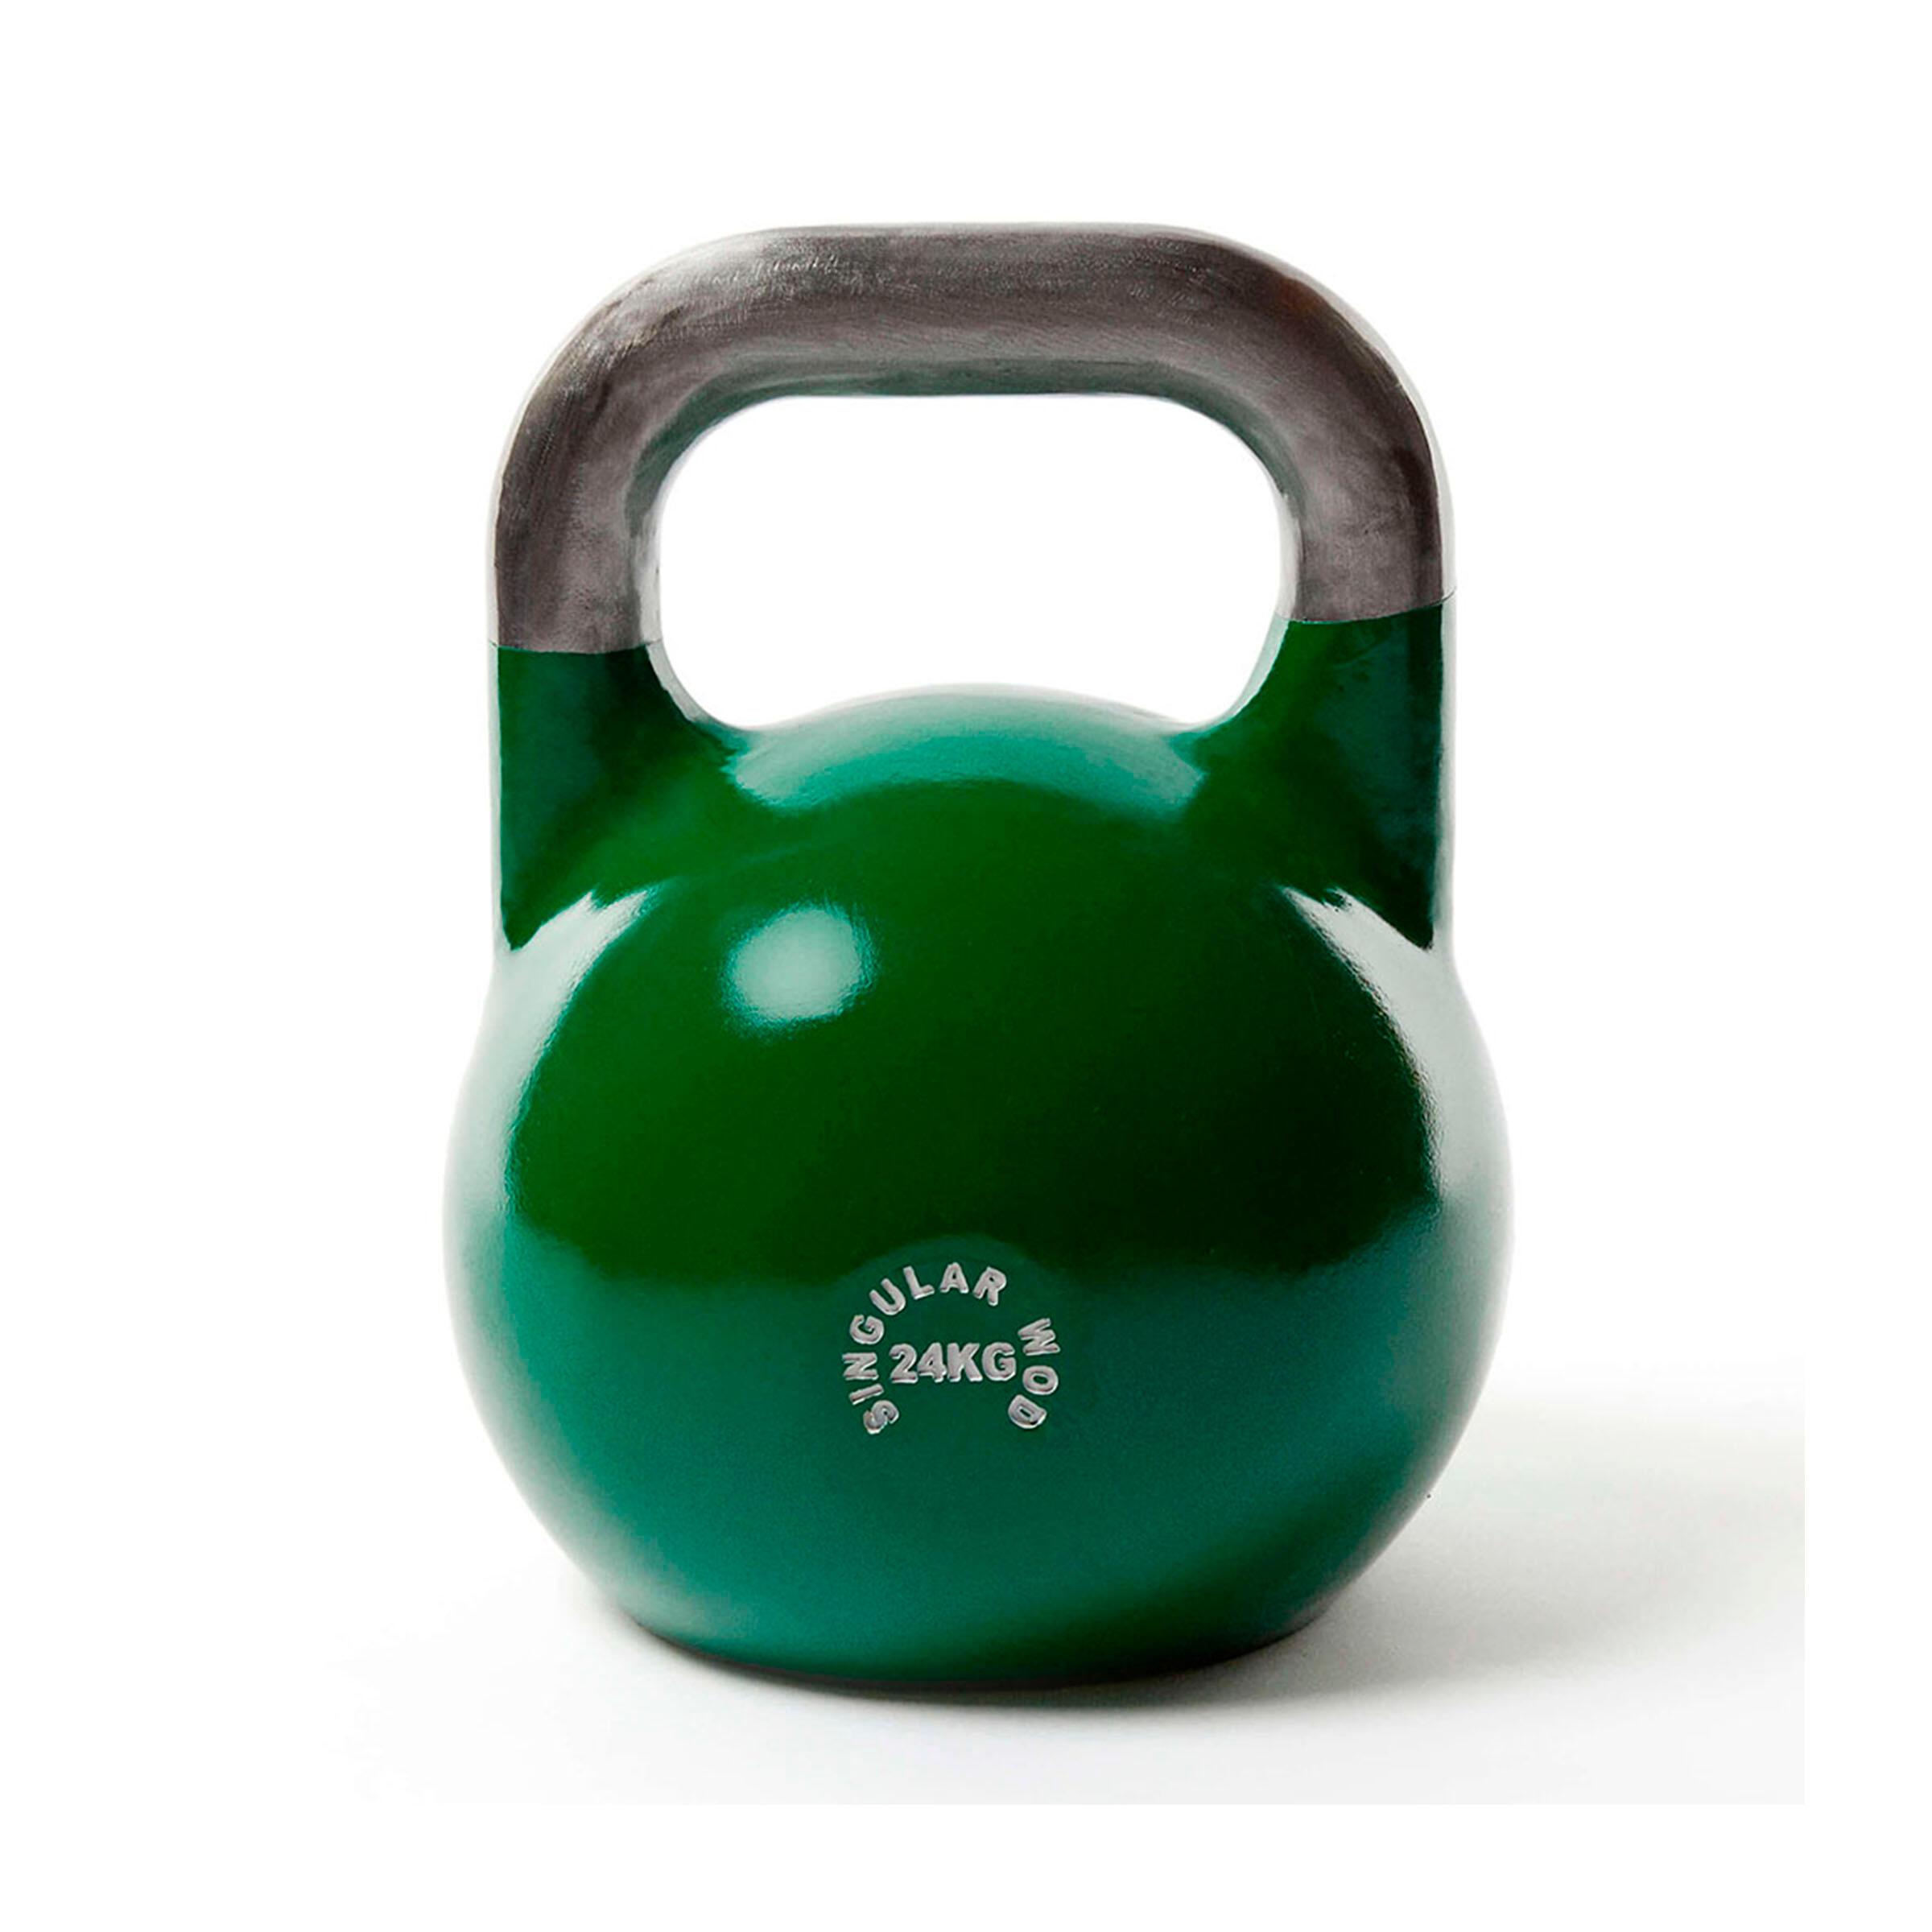 Kettlebell Pesa Rusa 24kg. Evergy Cross Fitness Musculación